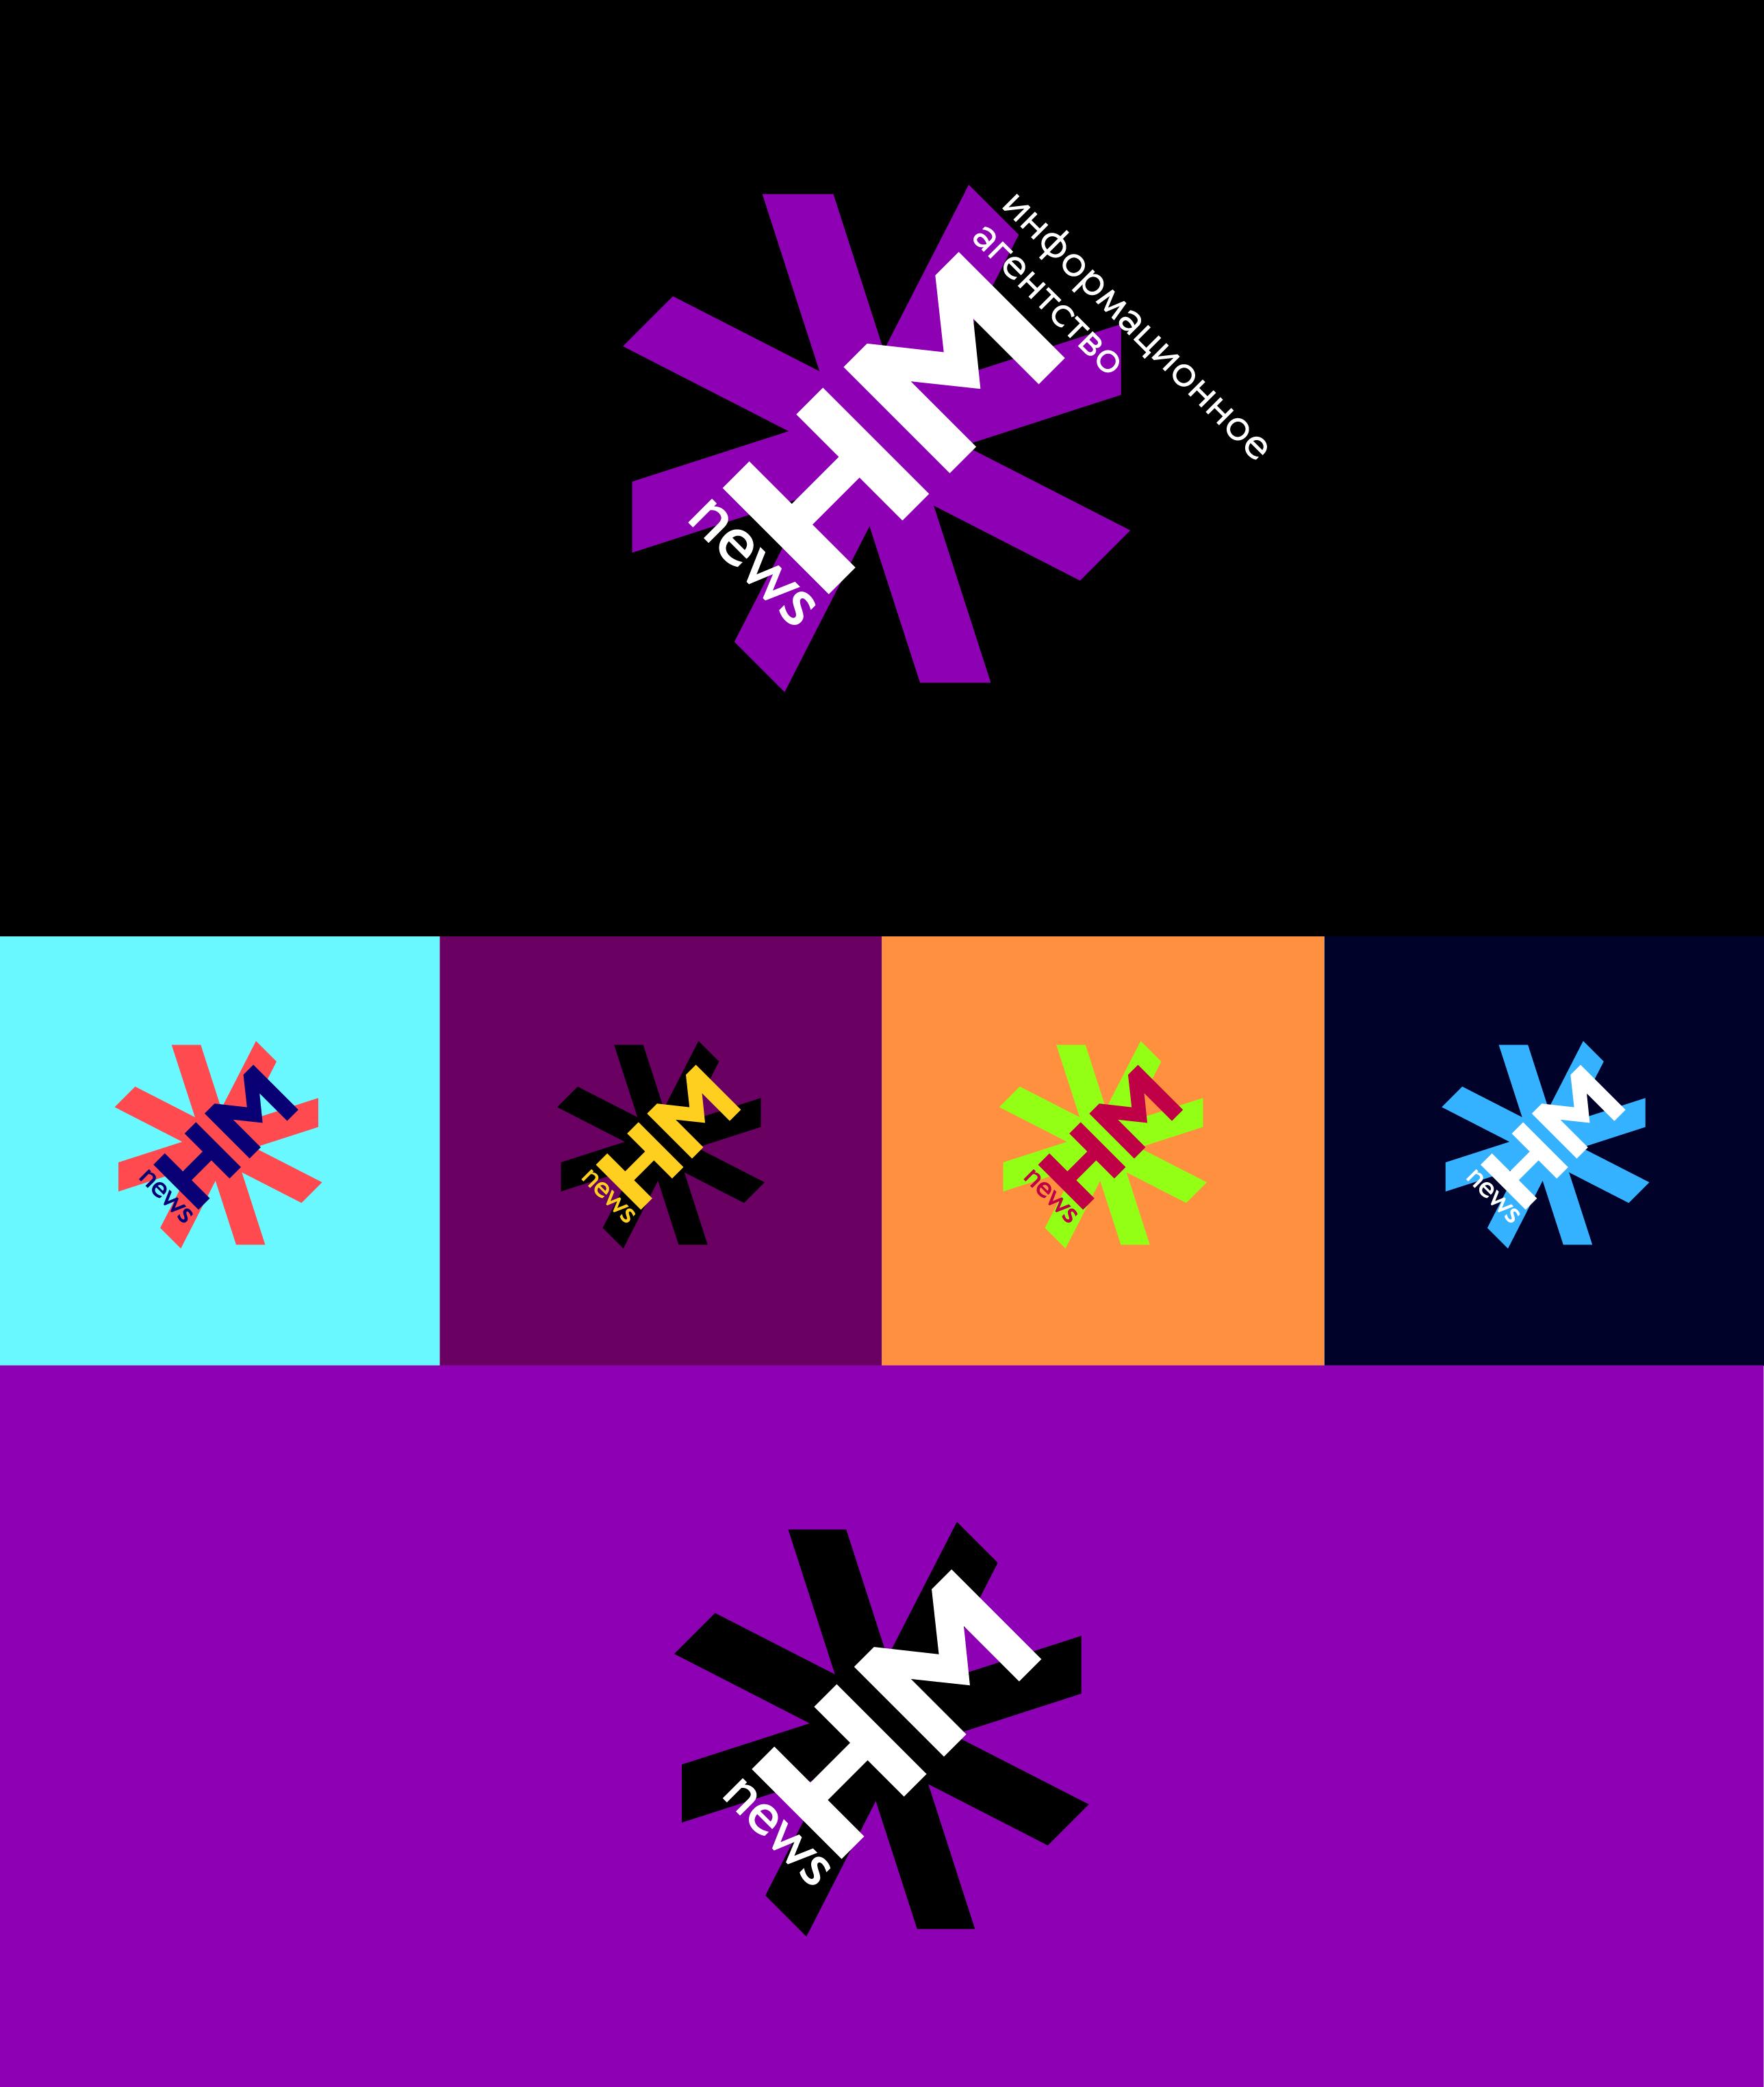 Логотип для информационного агентства фото f_0215aa93b7706e61.jpg